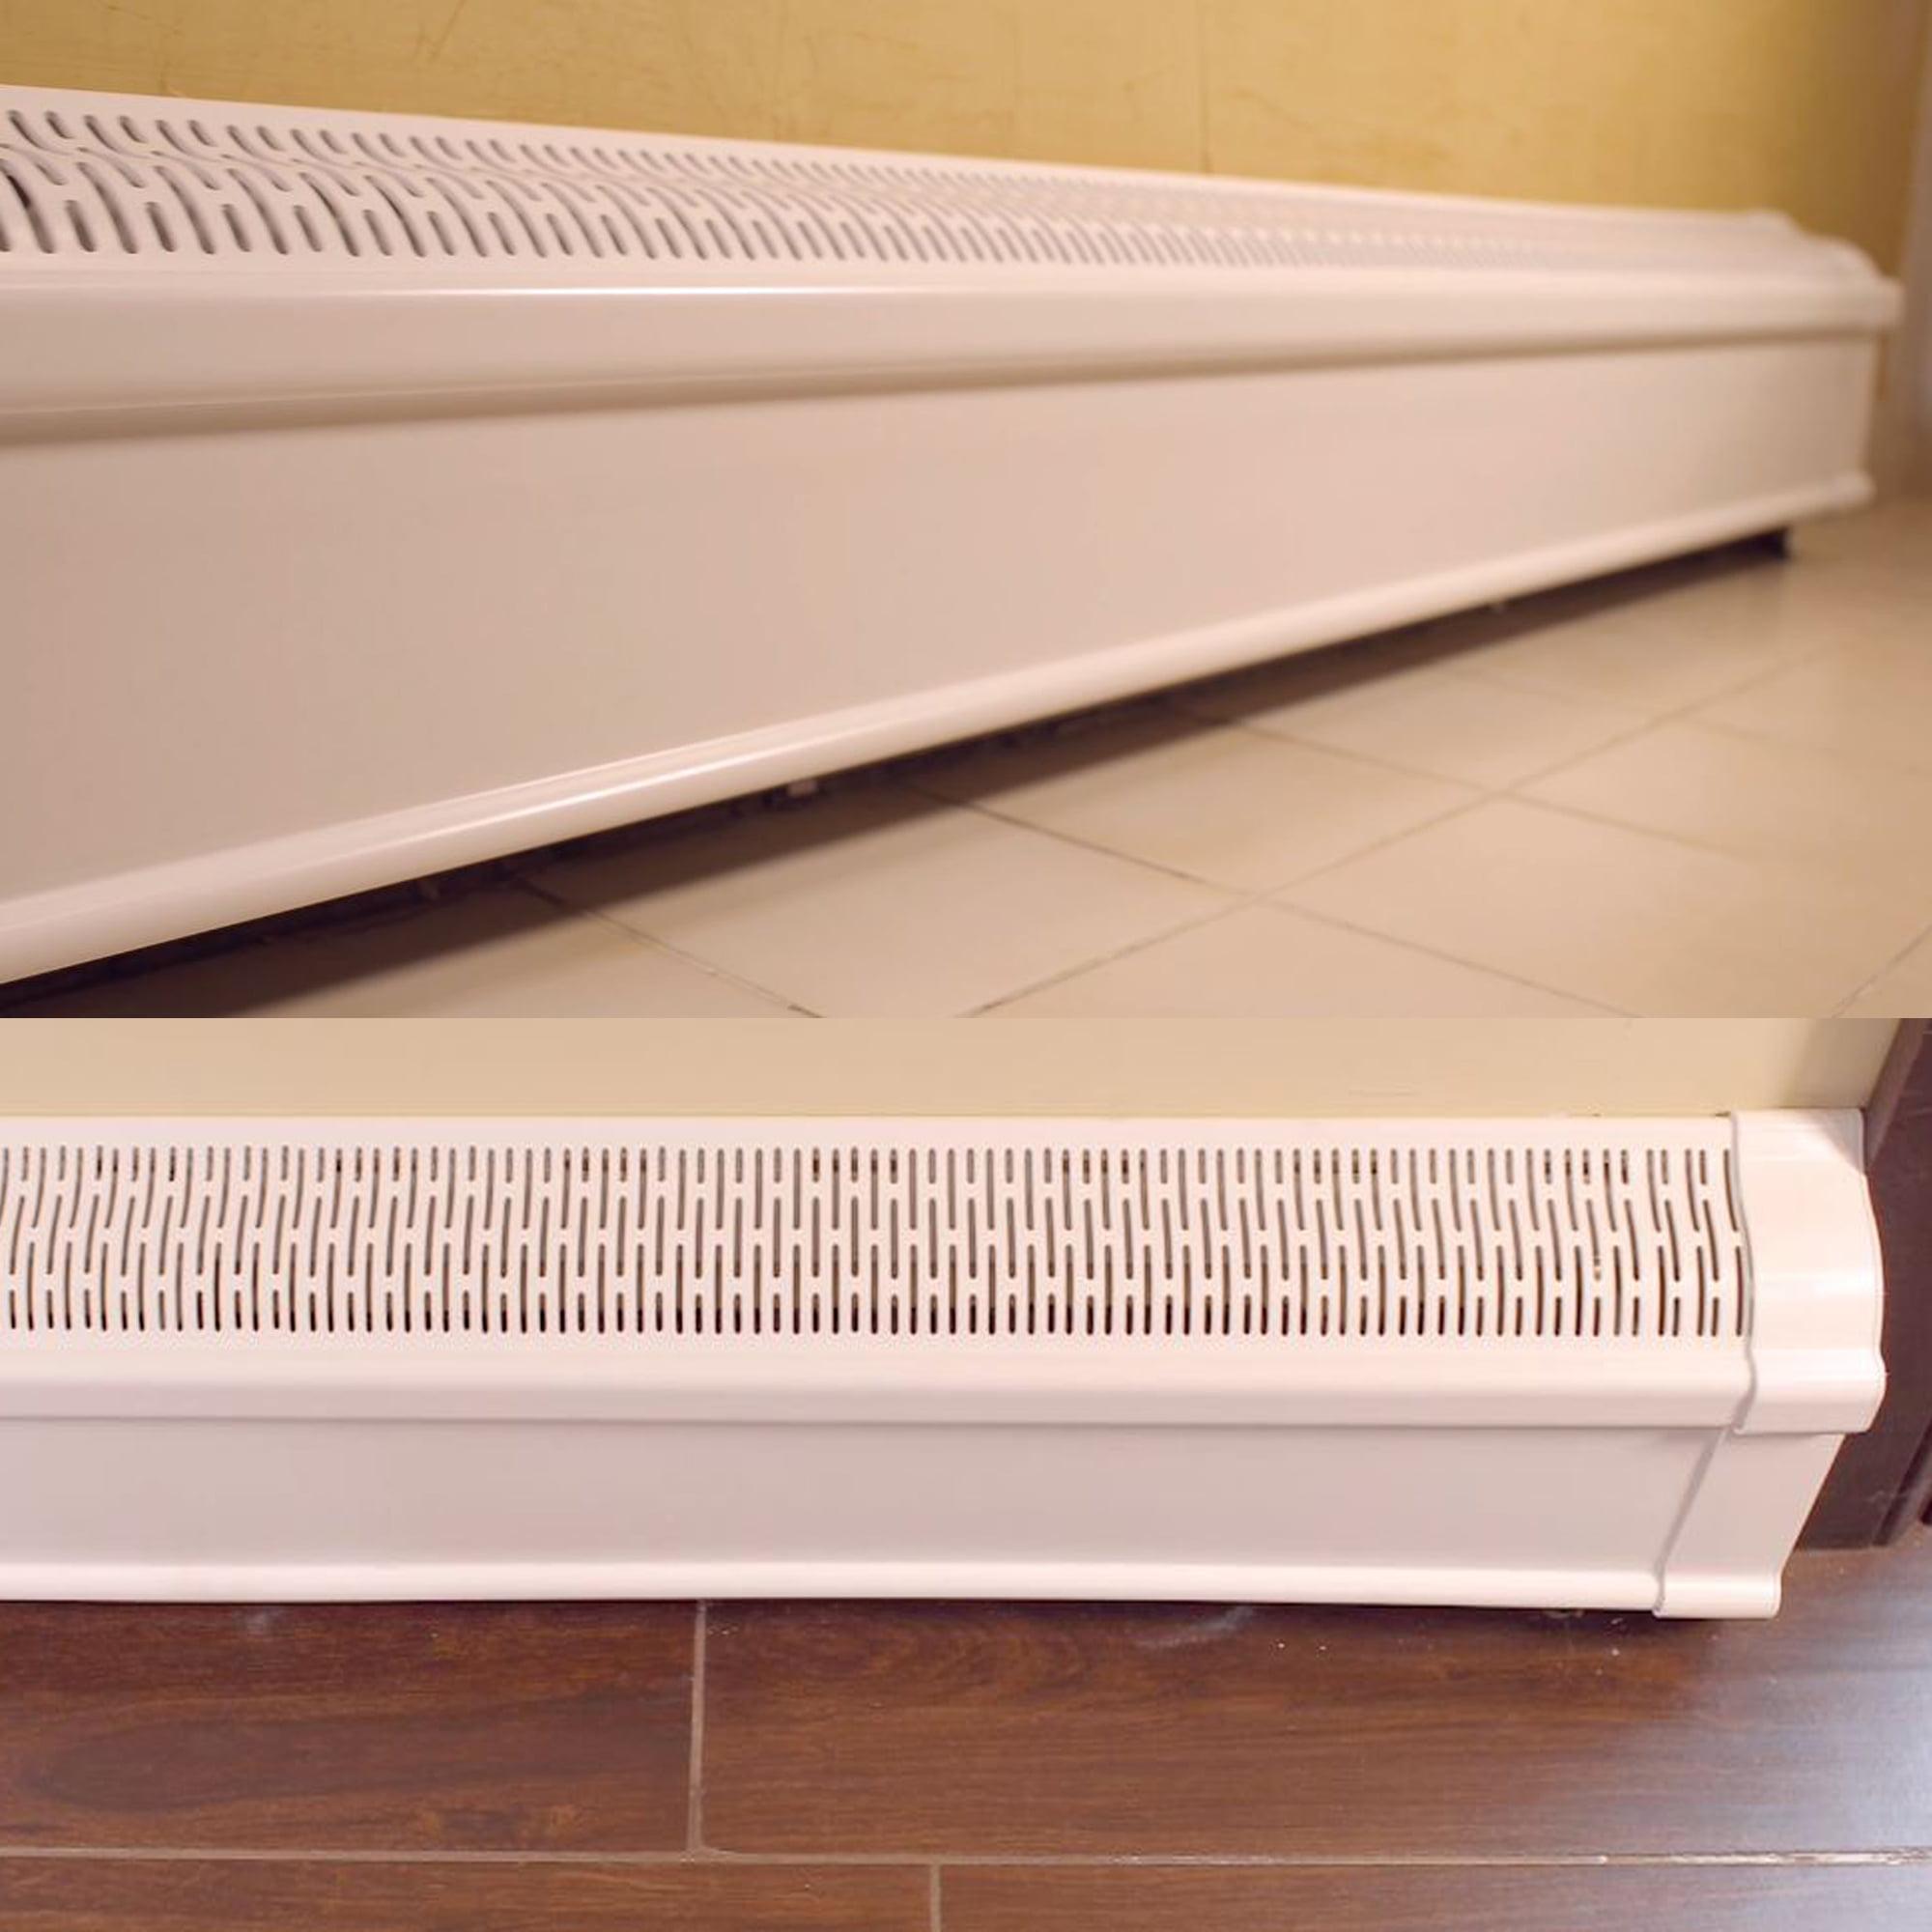 Baseboard Heat Covers Complete Set 2 Feet White